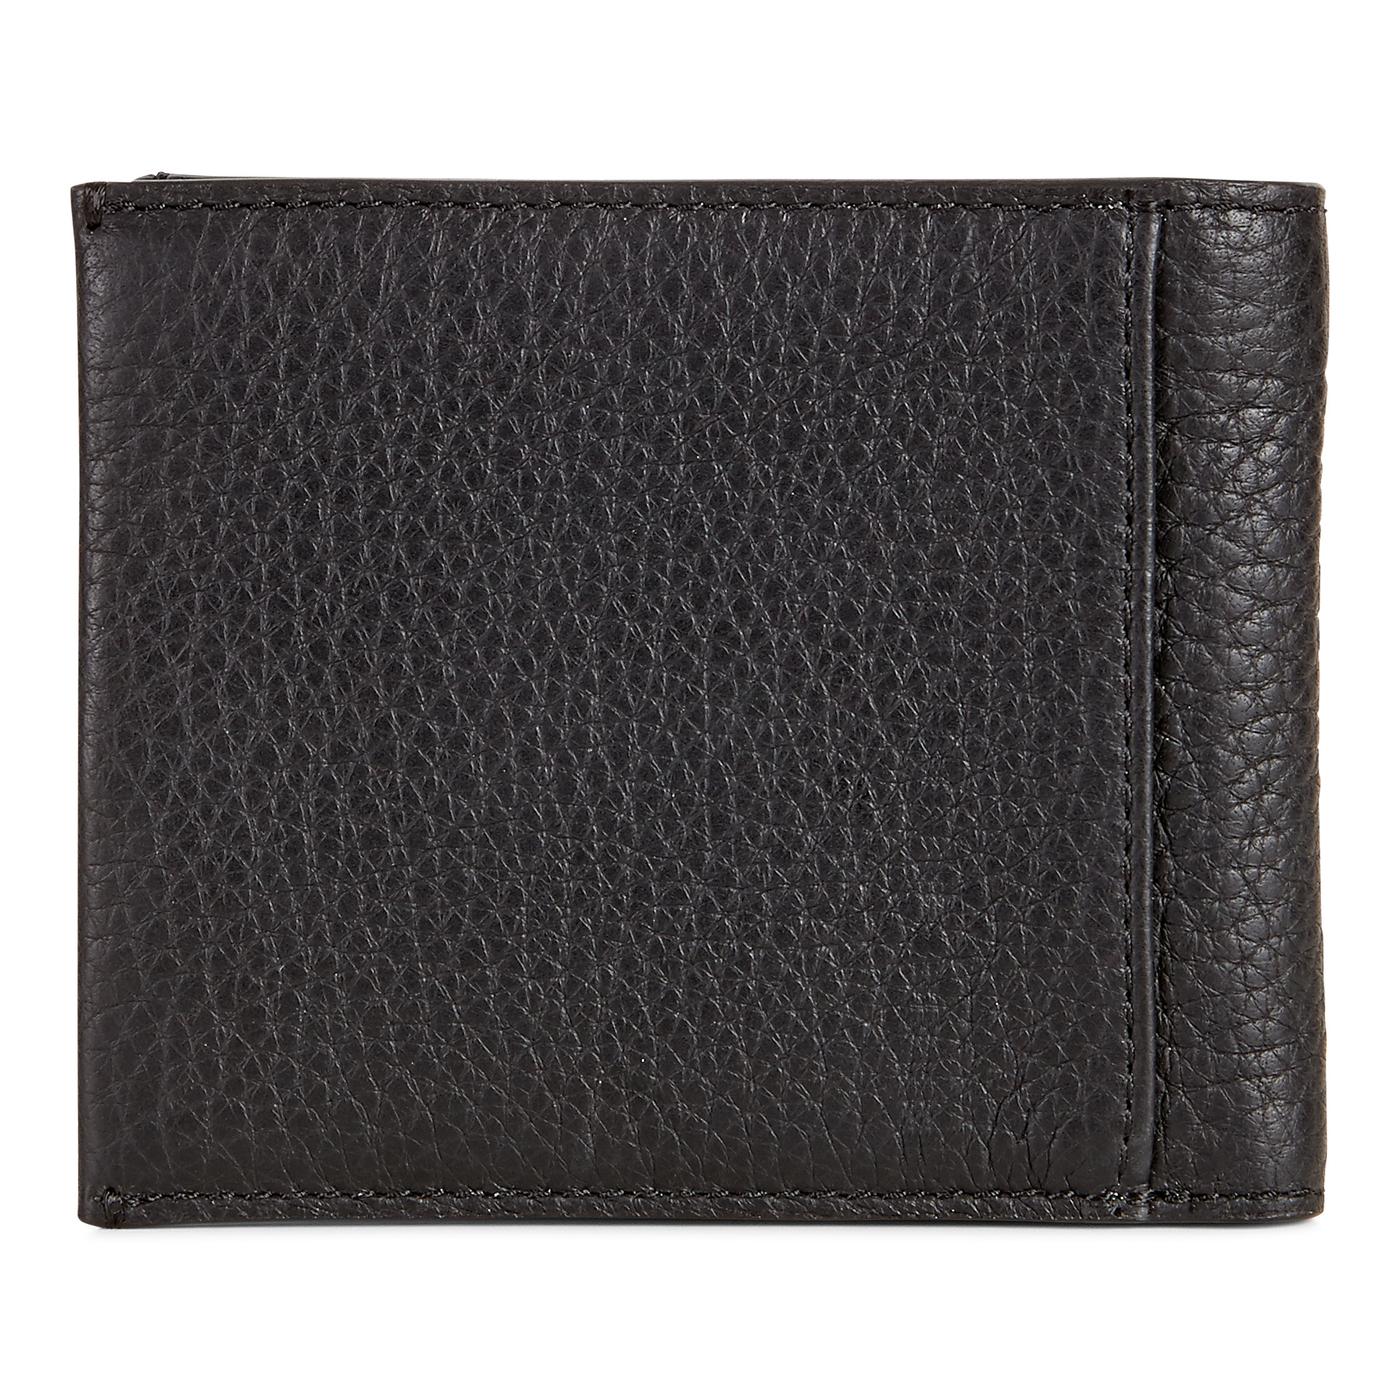 ECCO ARNE RFID Billfold Wallet